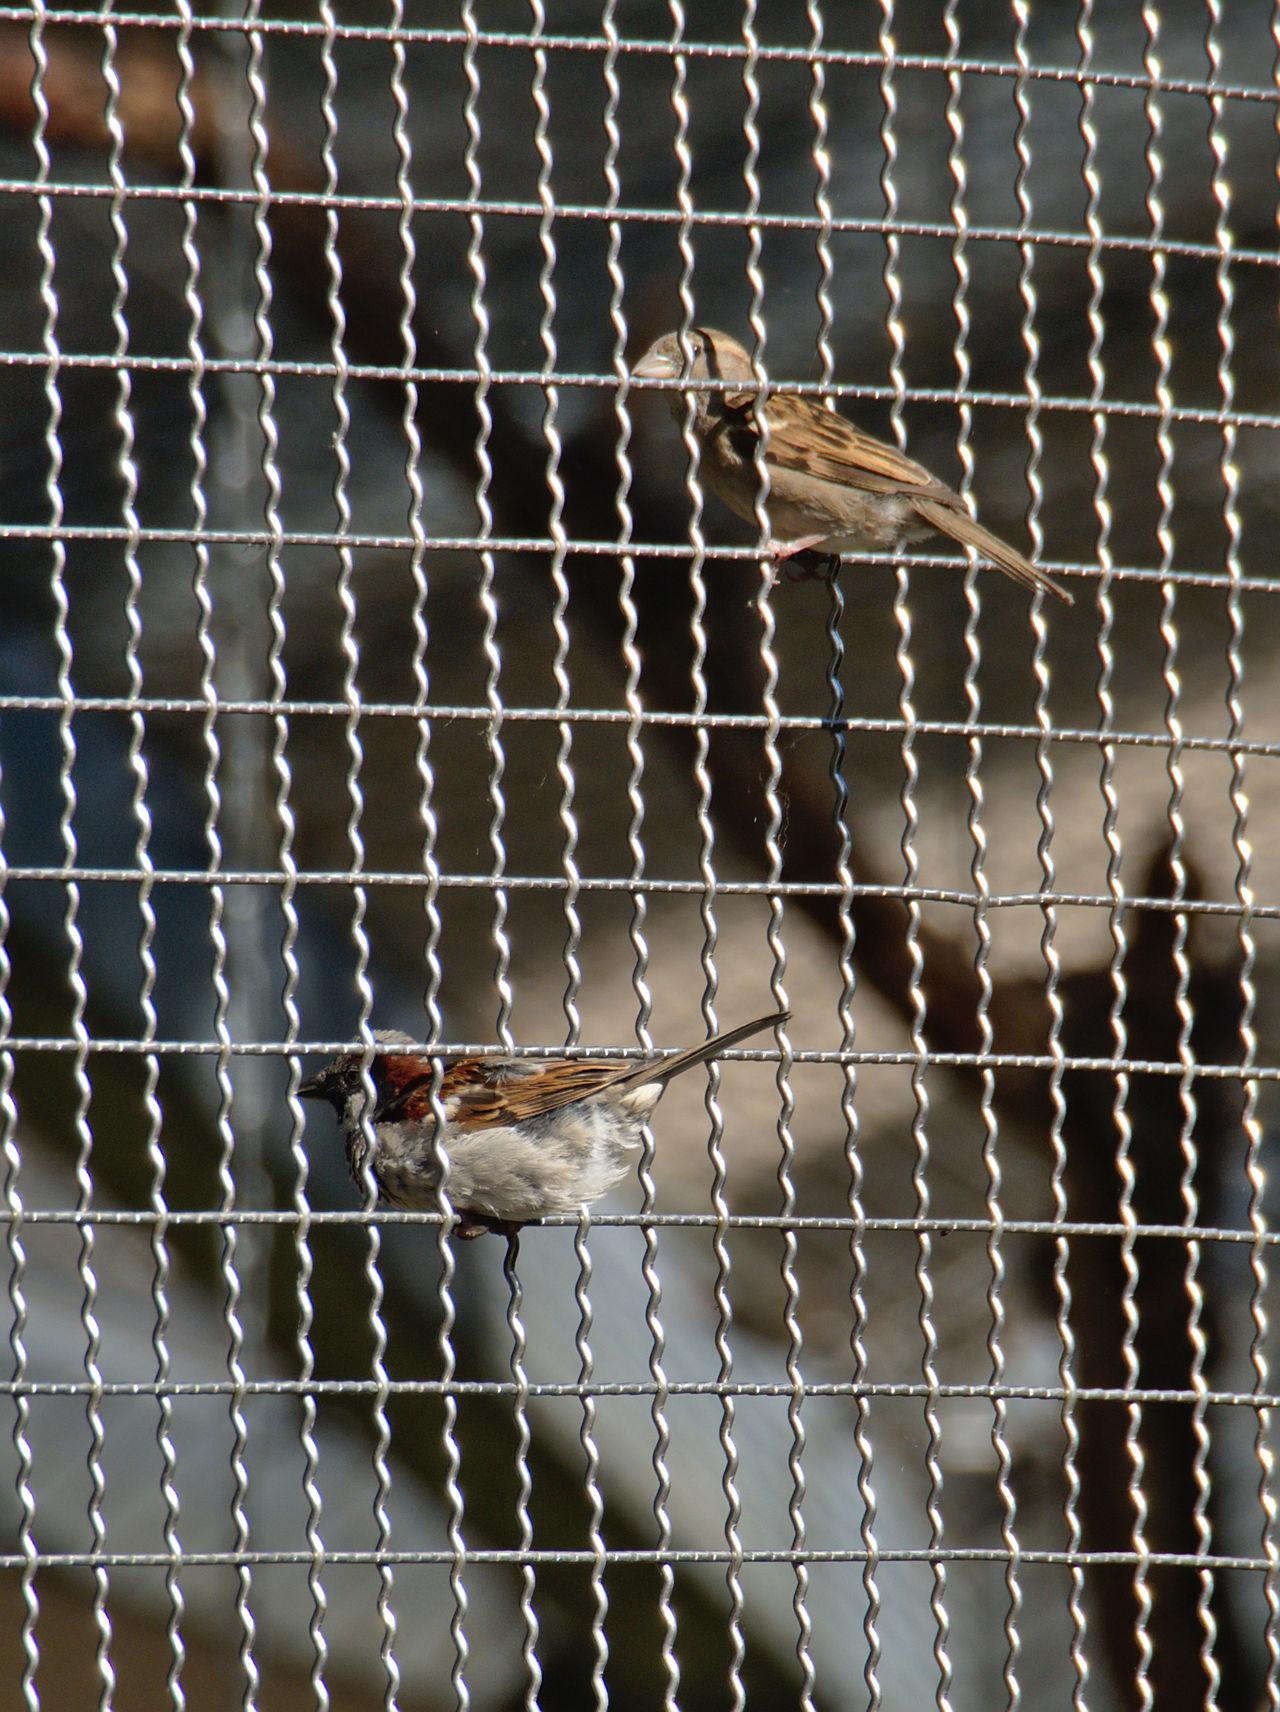 20190613_Zoo_Landau_075